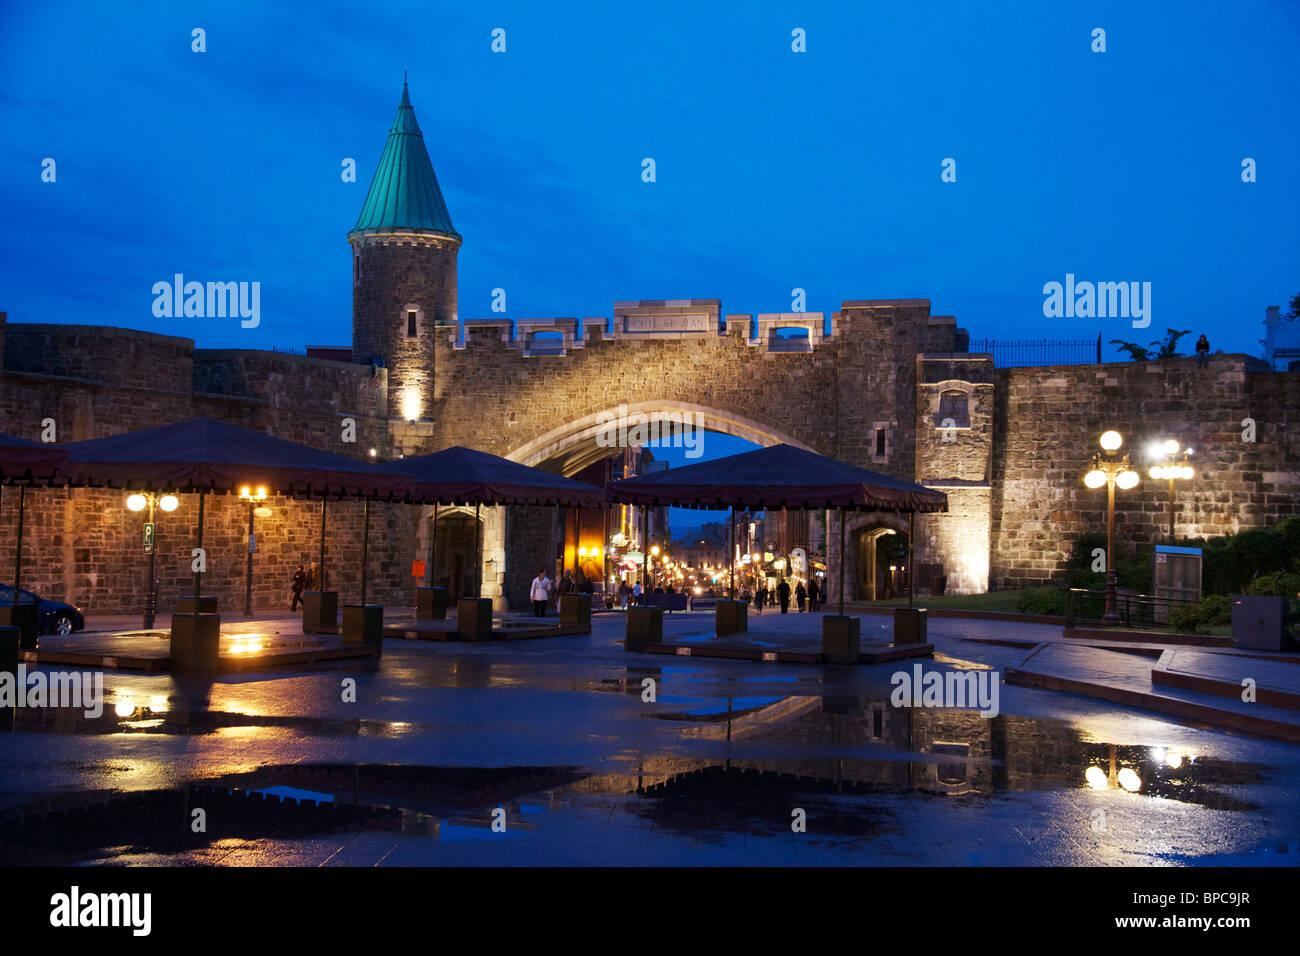 St john 39 s gate at night and place de y 39 ouville porte st for Porte quebec